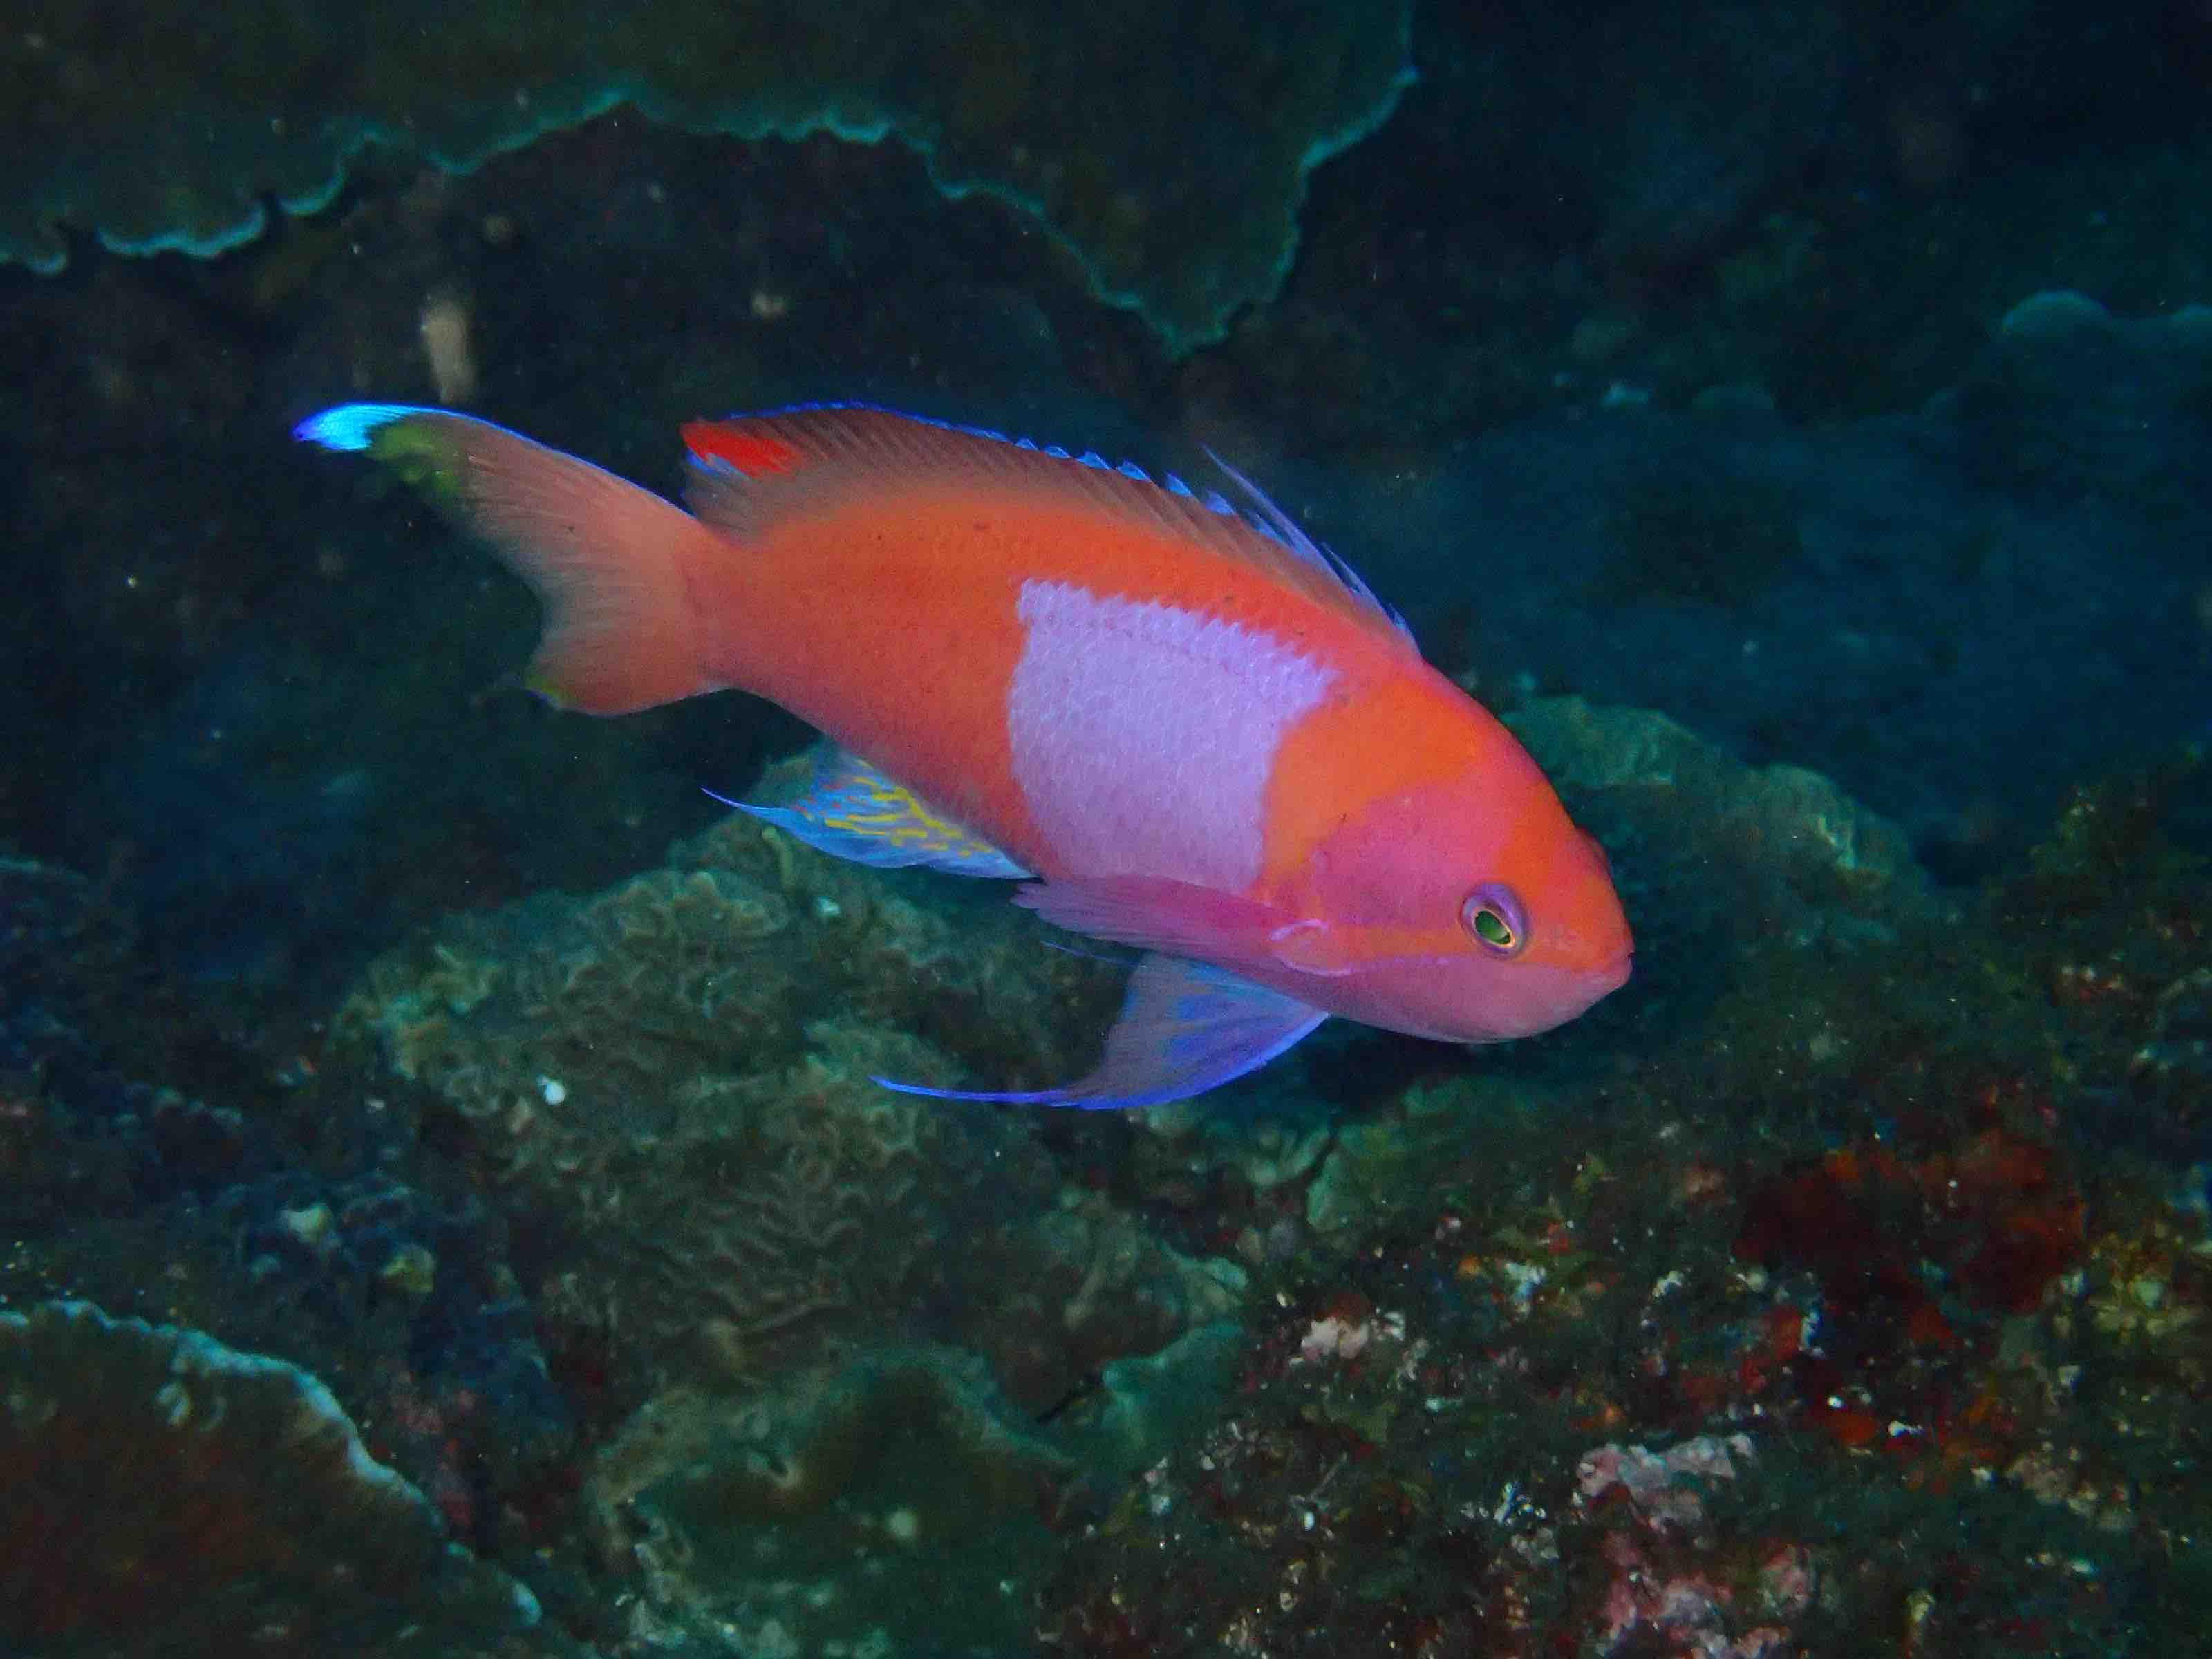 http://www.aquamarine-dive.net/blog/index.html/2016/07/15/P7150876.jpg